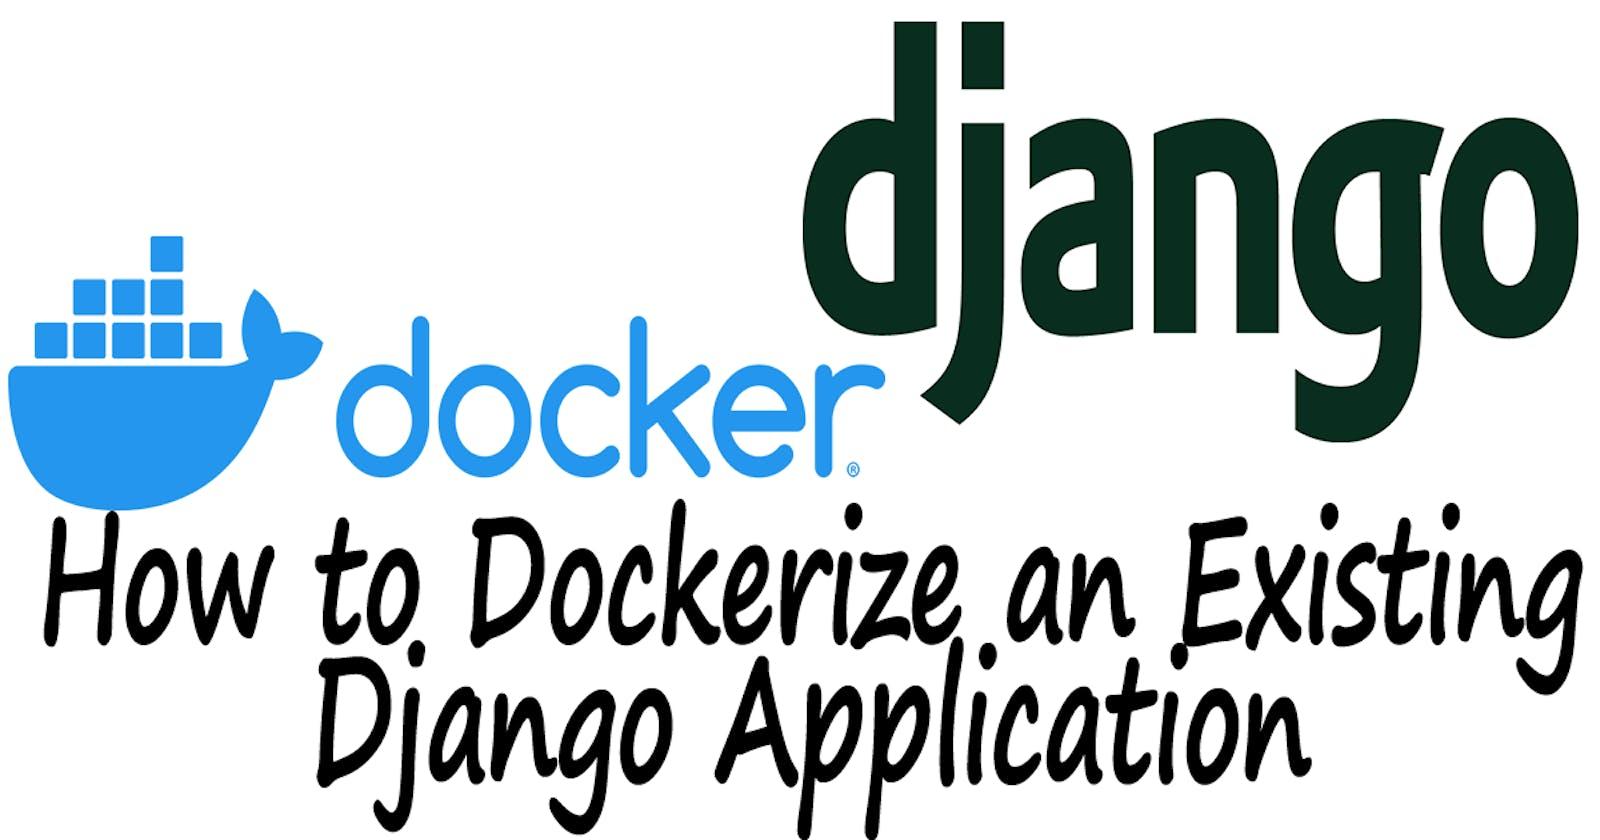 How to Dockerize an Existing Django Application